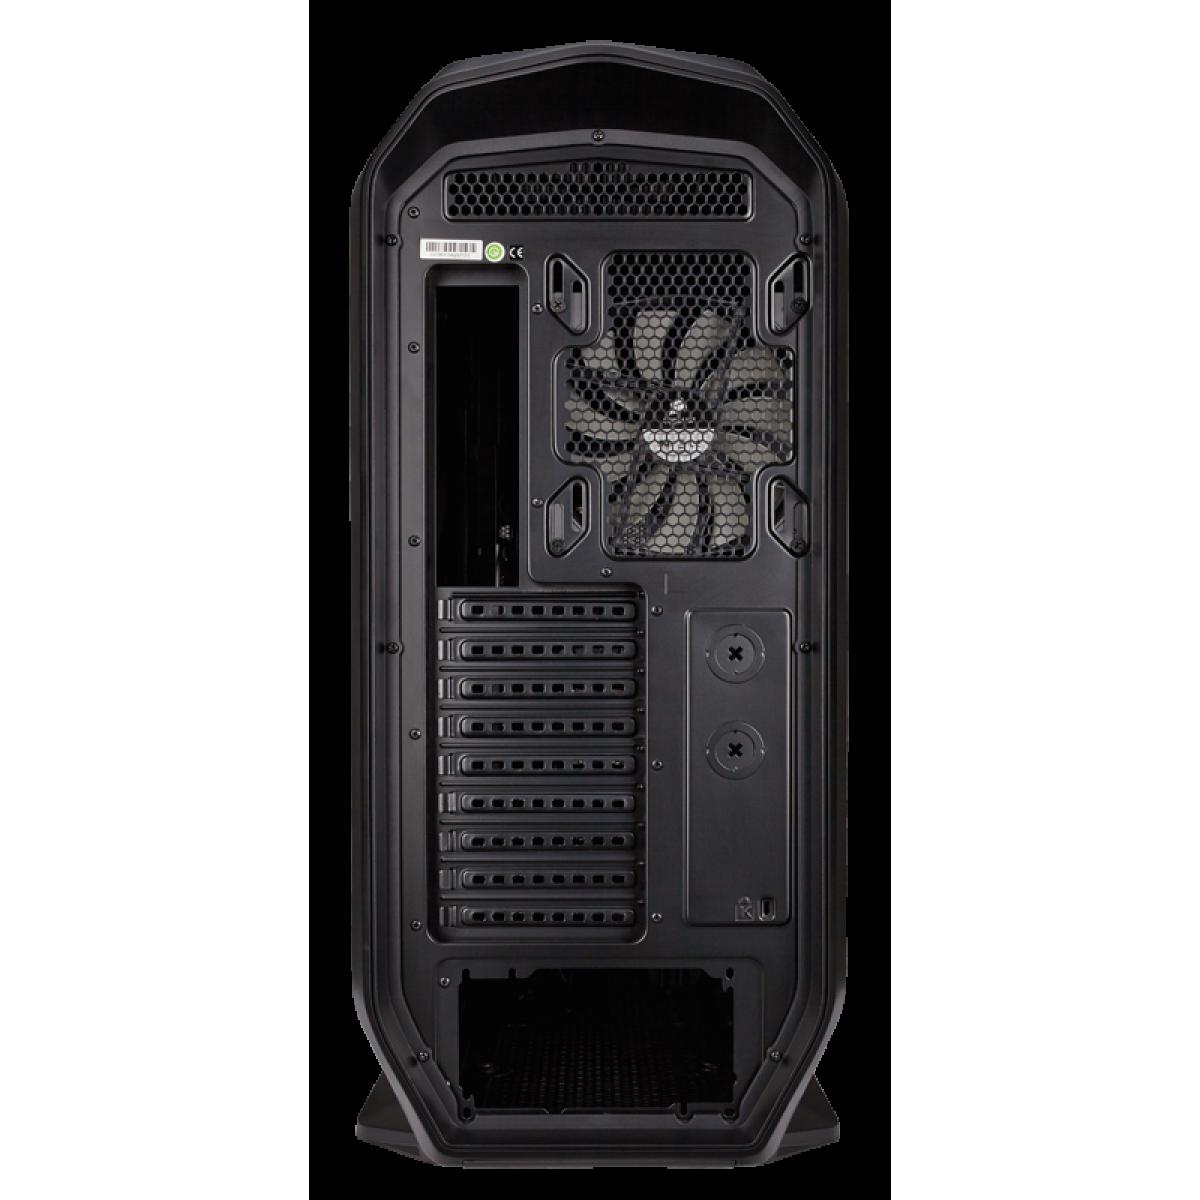 Gabinete Gamer Corsair, Graphite 780T, Full Tower, Acrílico, Black, Sem Fonte, Com 3 Fans